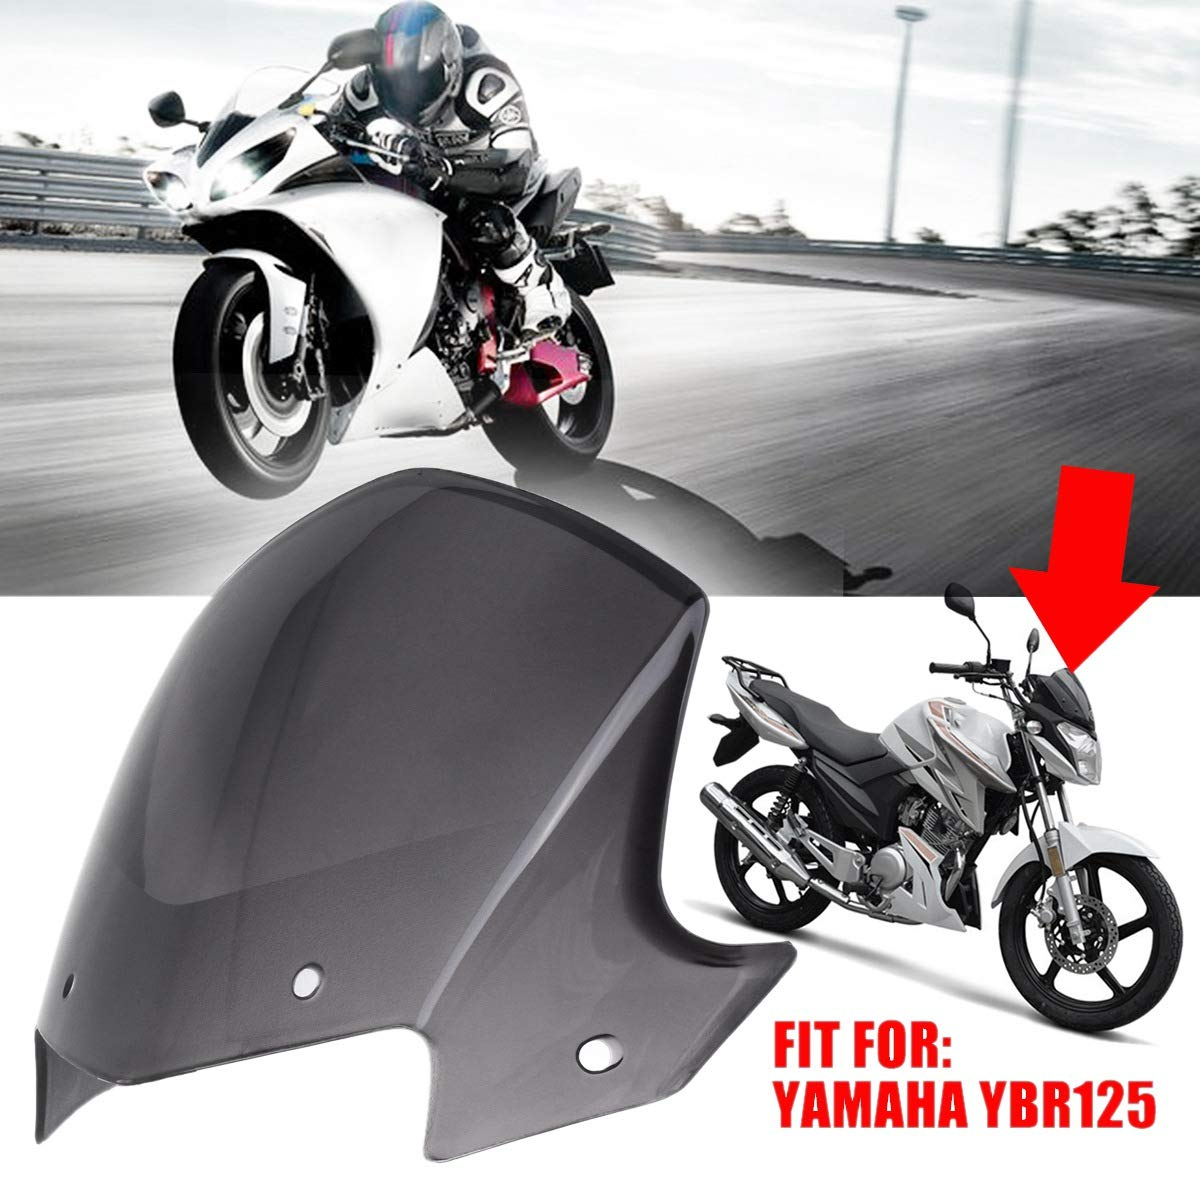 Semoic Cupolino Moto Trasparente Marrone Trasparente per Ybr 125 2014-2017